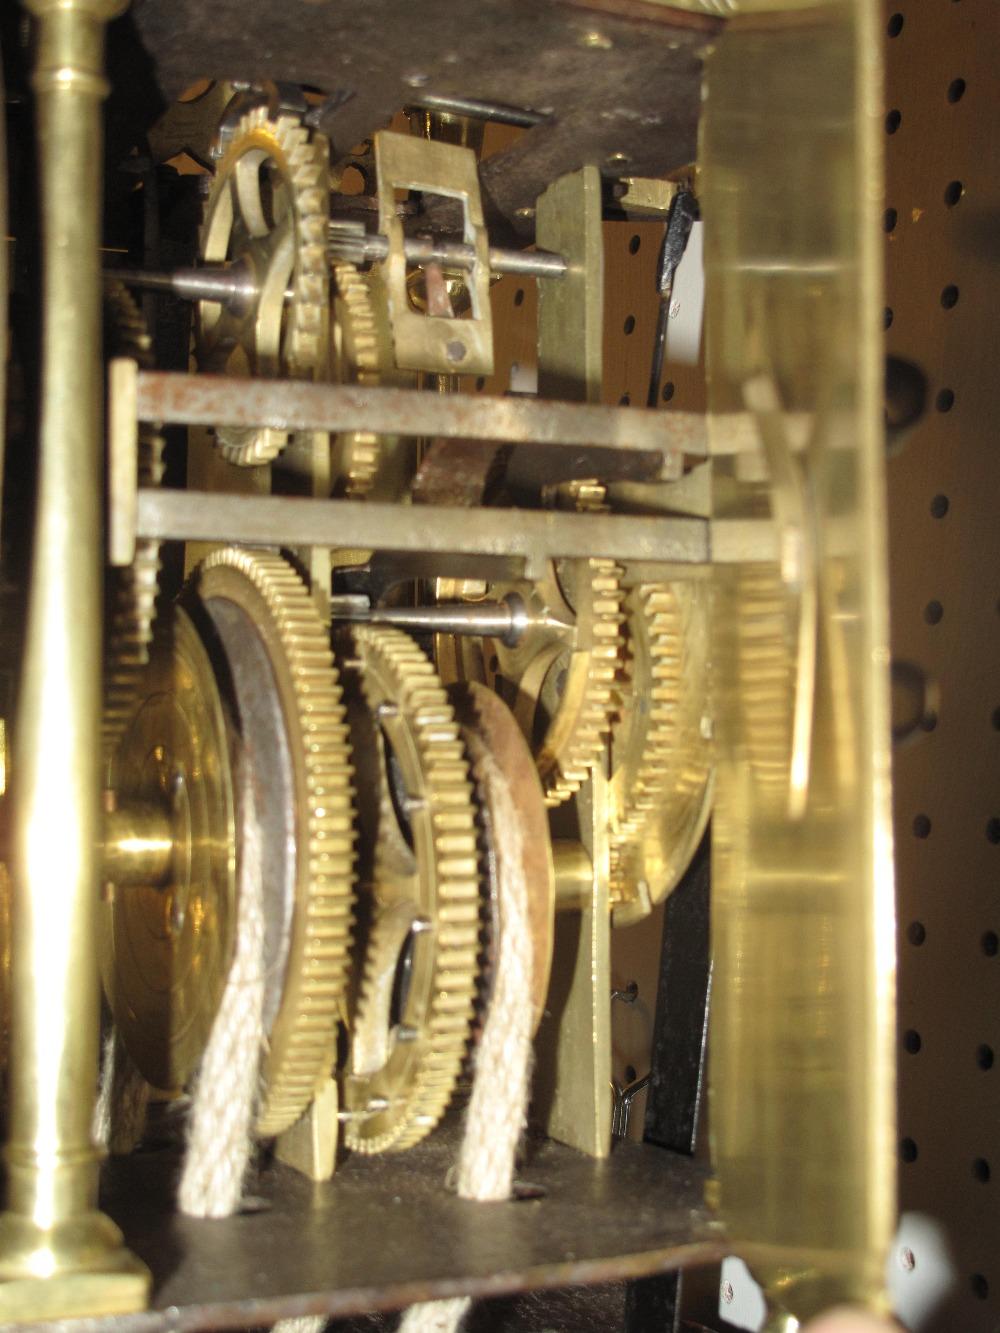 17TH CENTURY STYLE BRASS LANTERN CLOCK t - Image 5 of 5